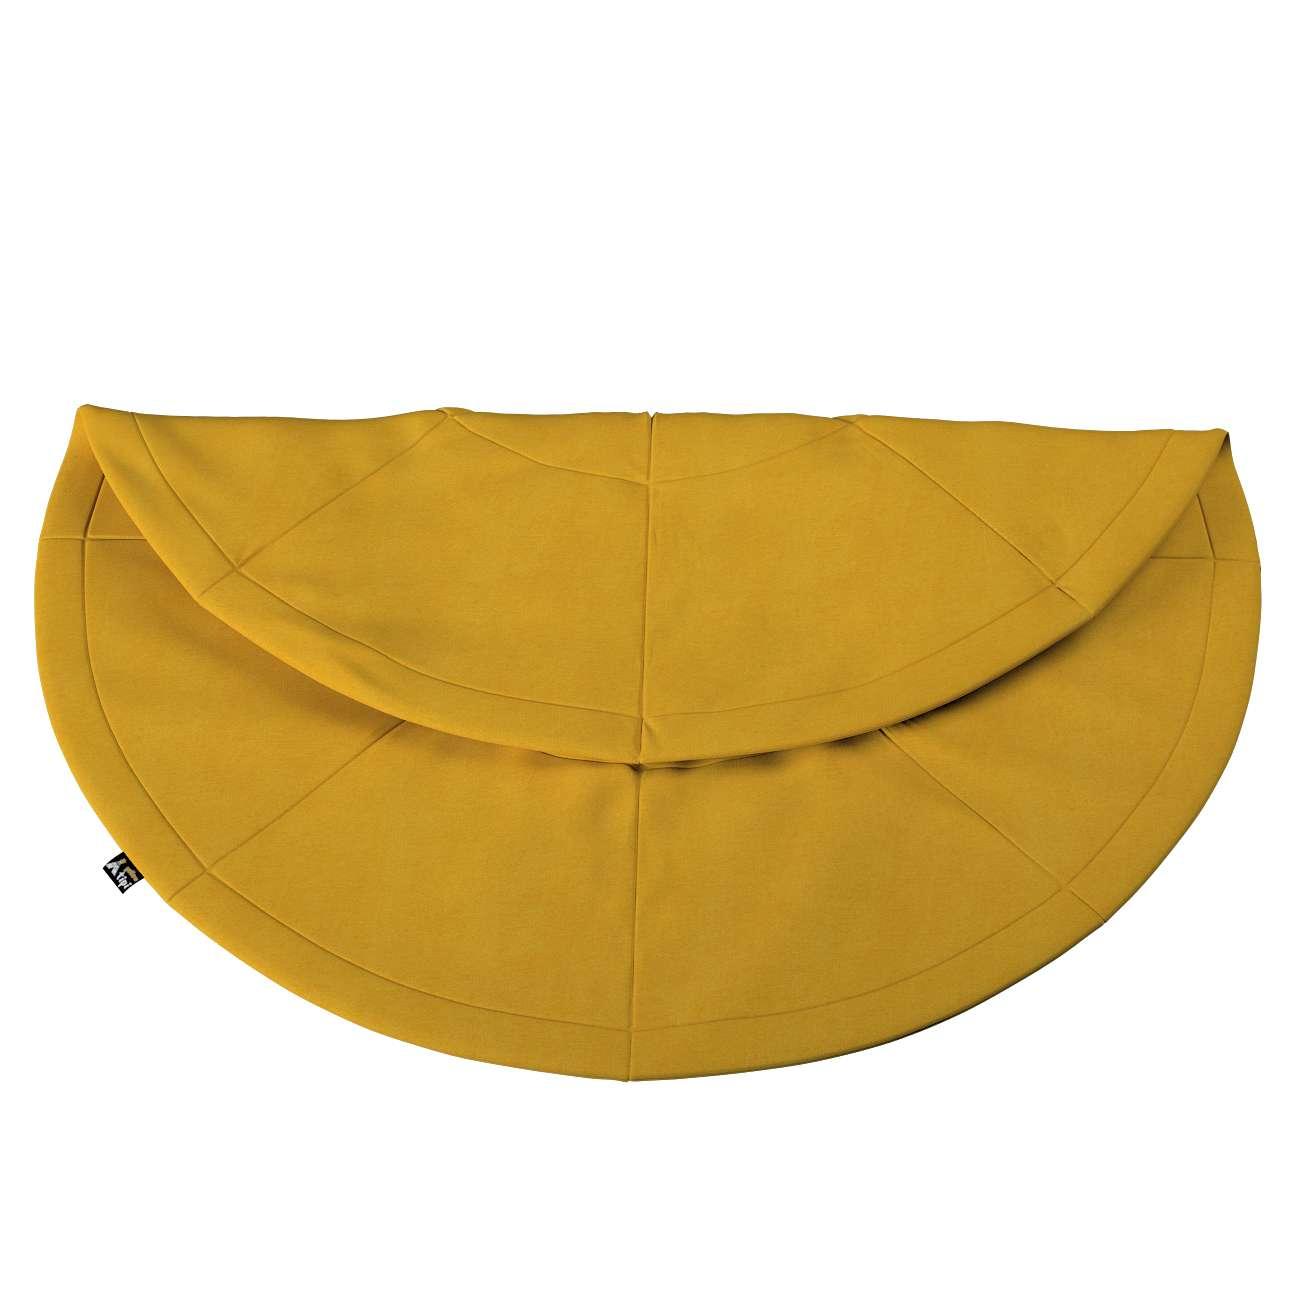 Mata okrągła w kolekcji Lollipop, tkanina: 705-04